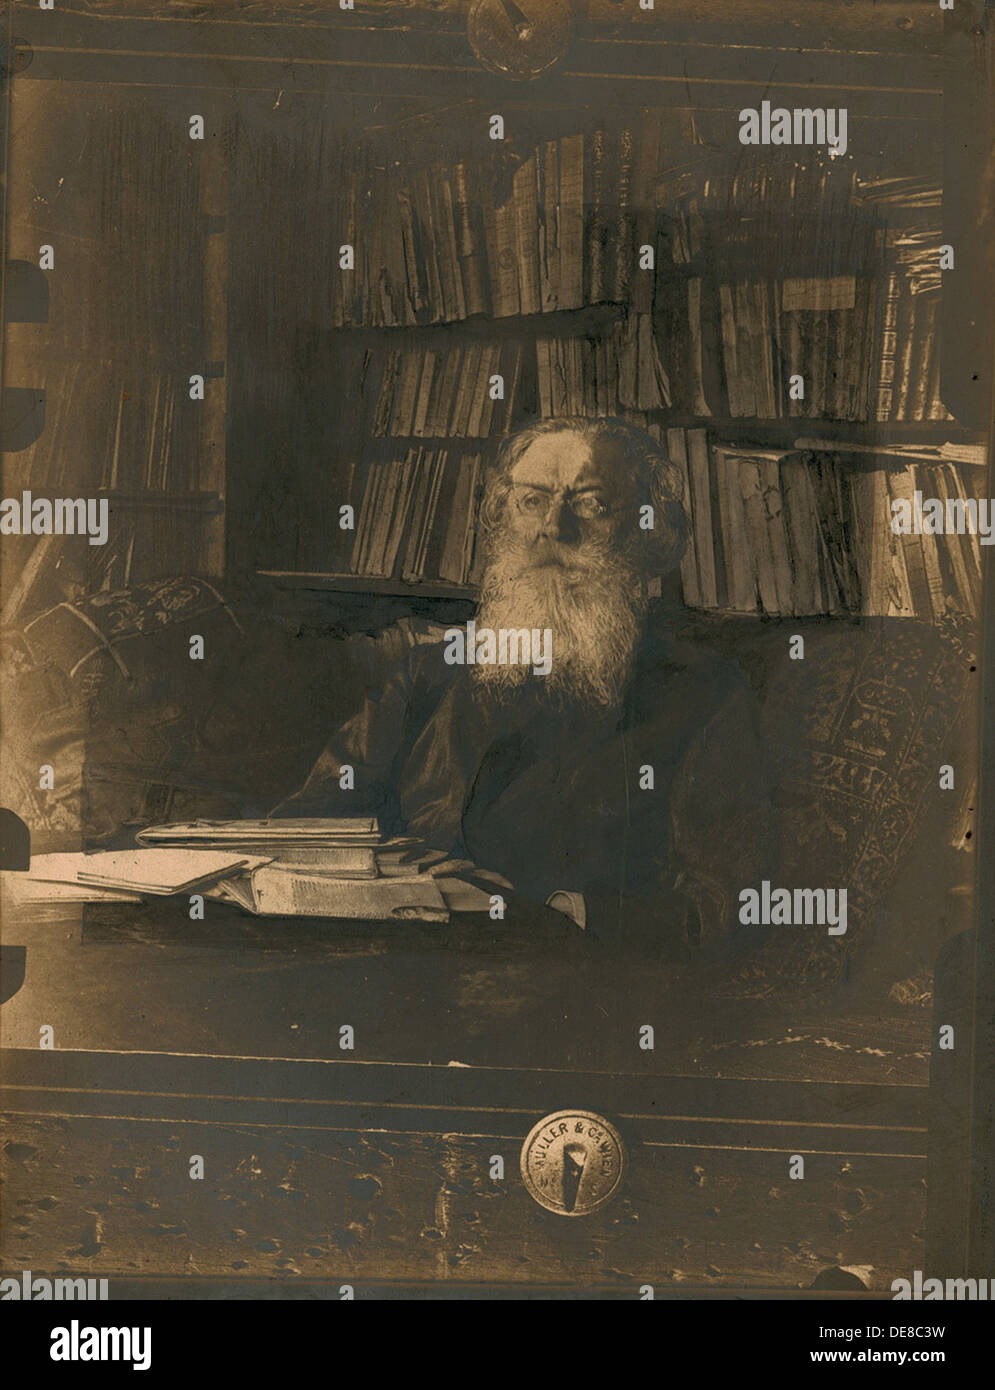 Theorist of narodism, philosopher, publicist, and sociologist Pyotr Lavrov (1823-1900). Artist: Anonymous - Stock Image